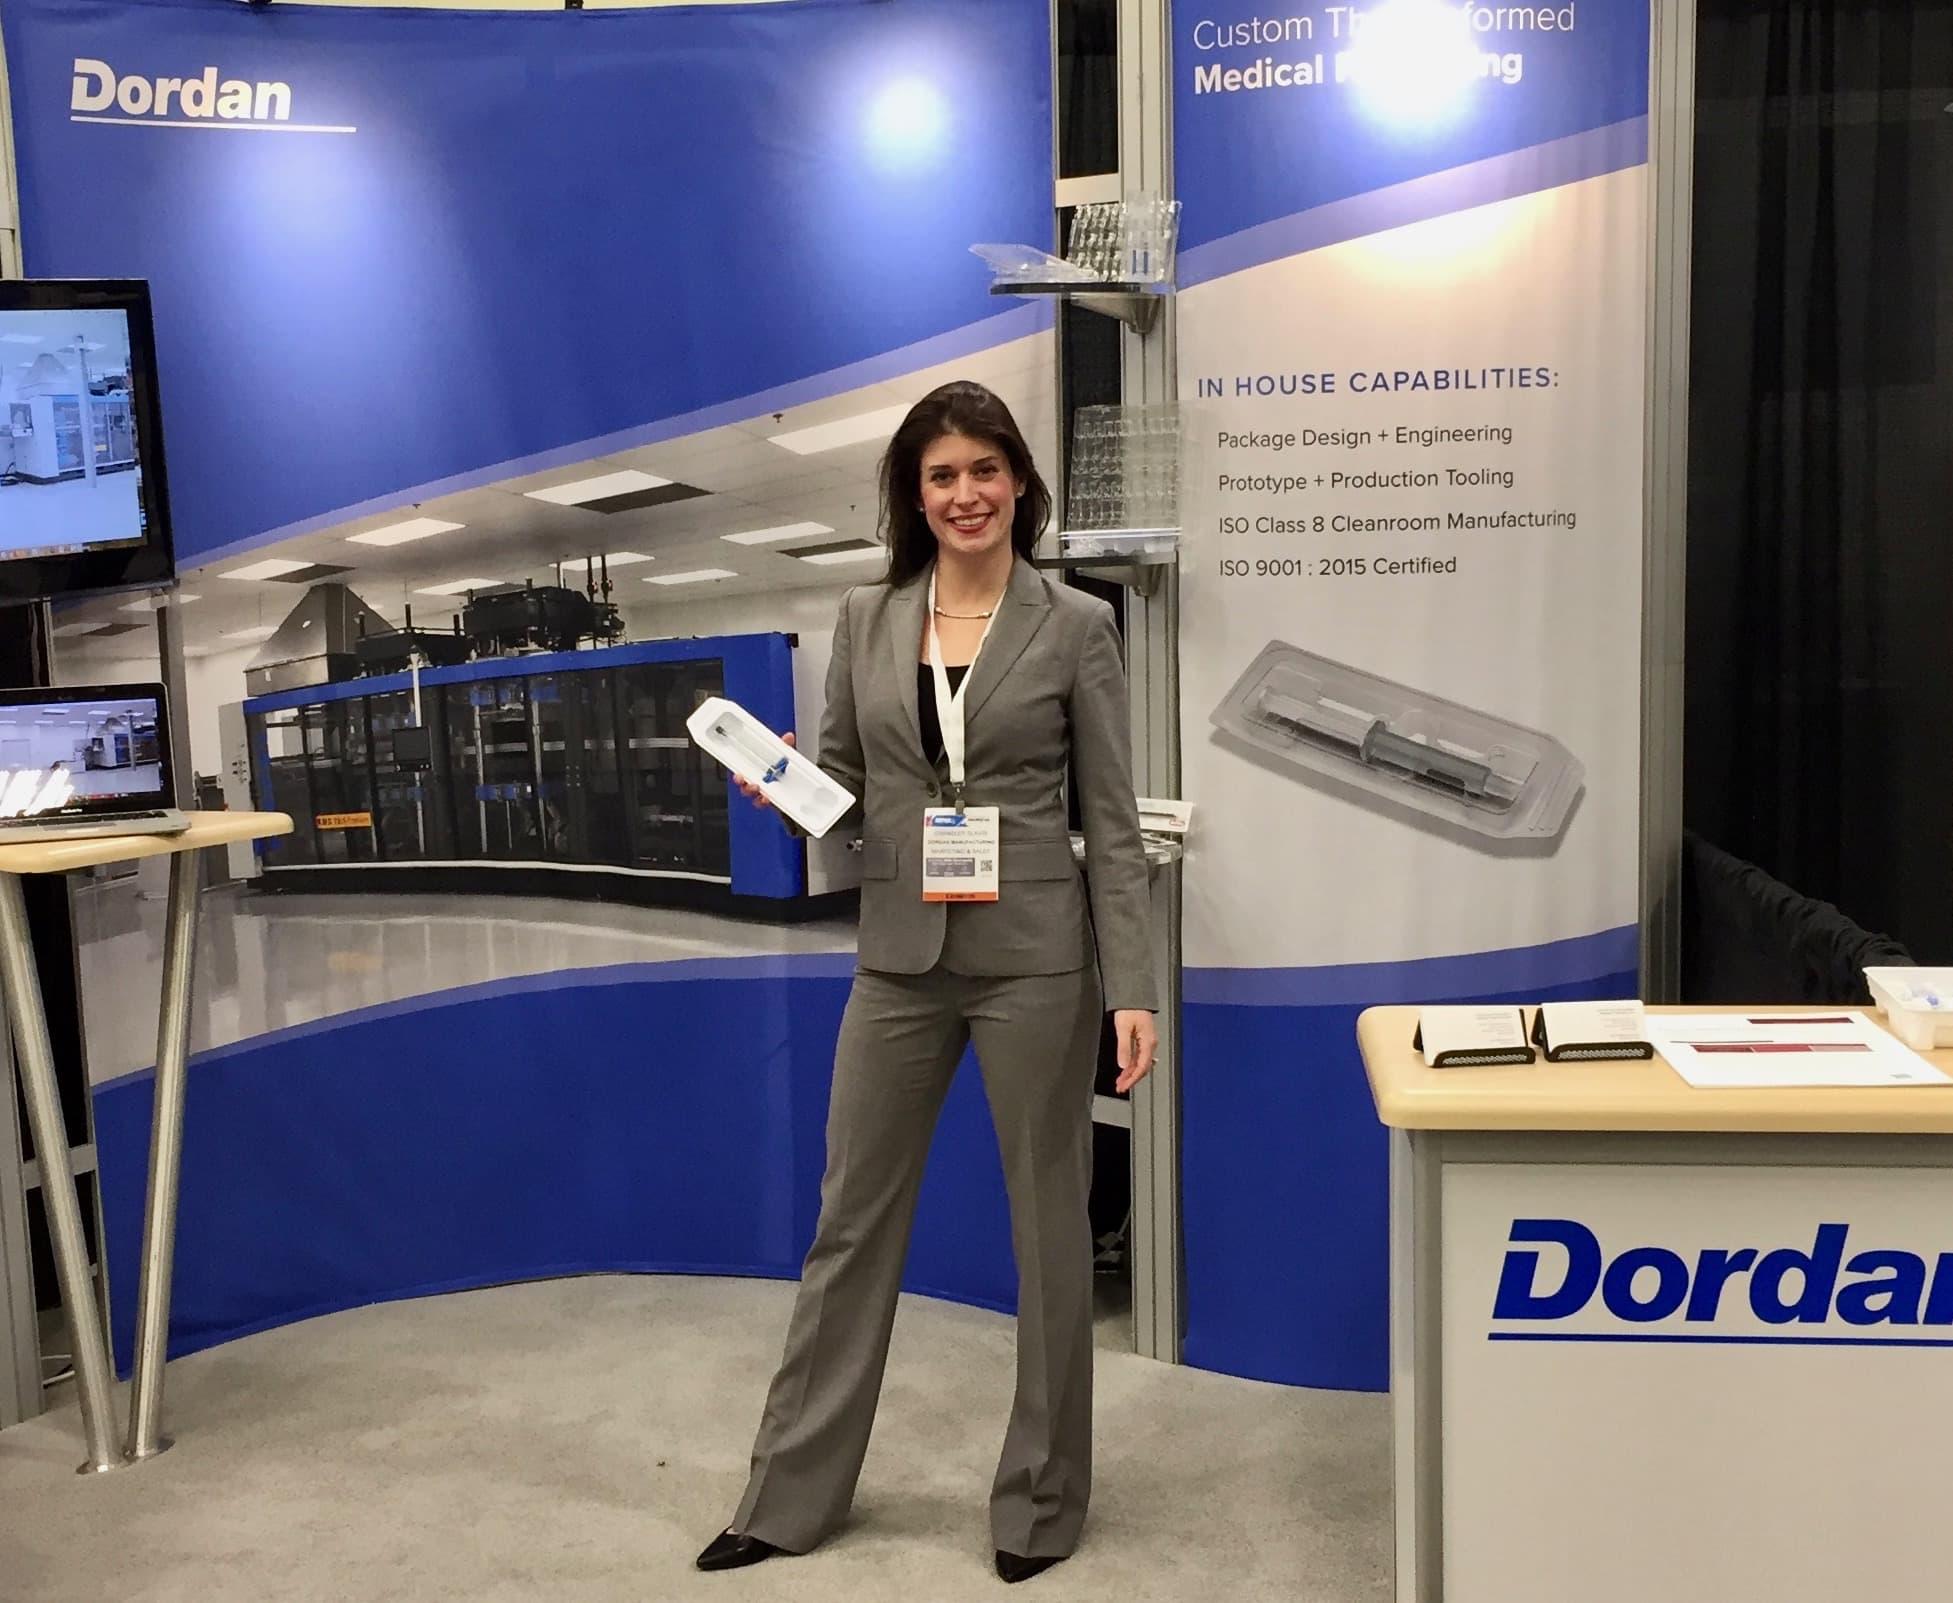 Dordan's tradeshow booth